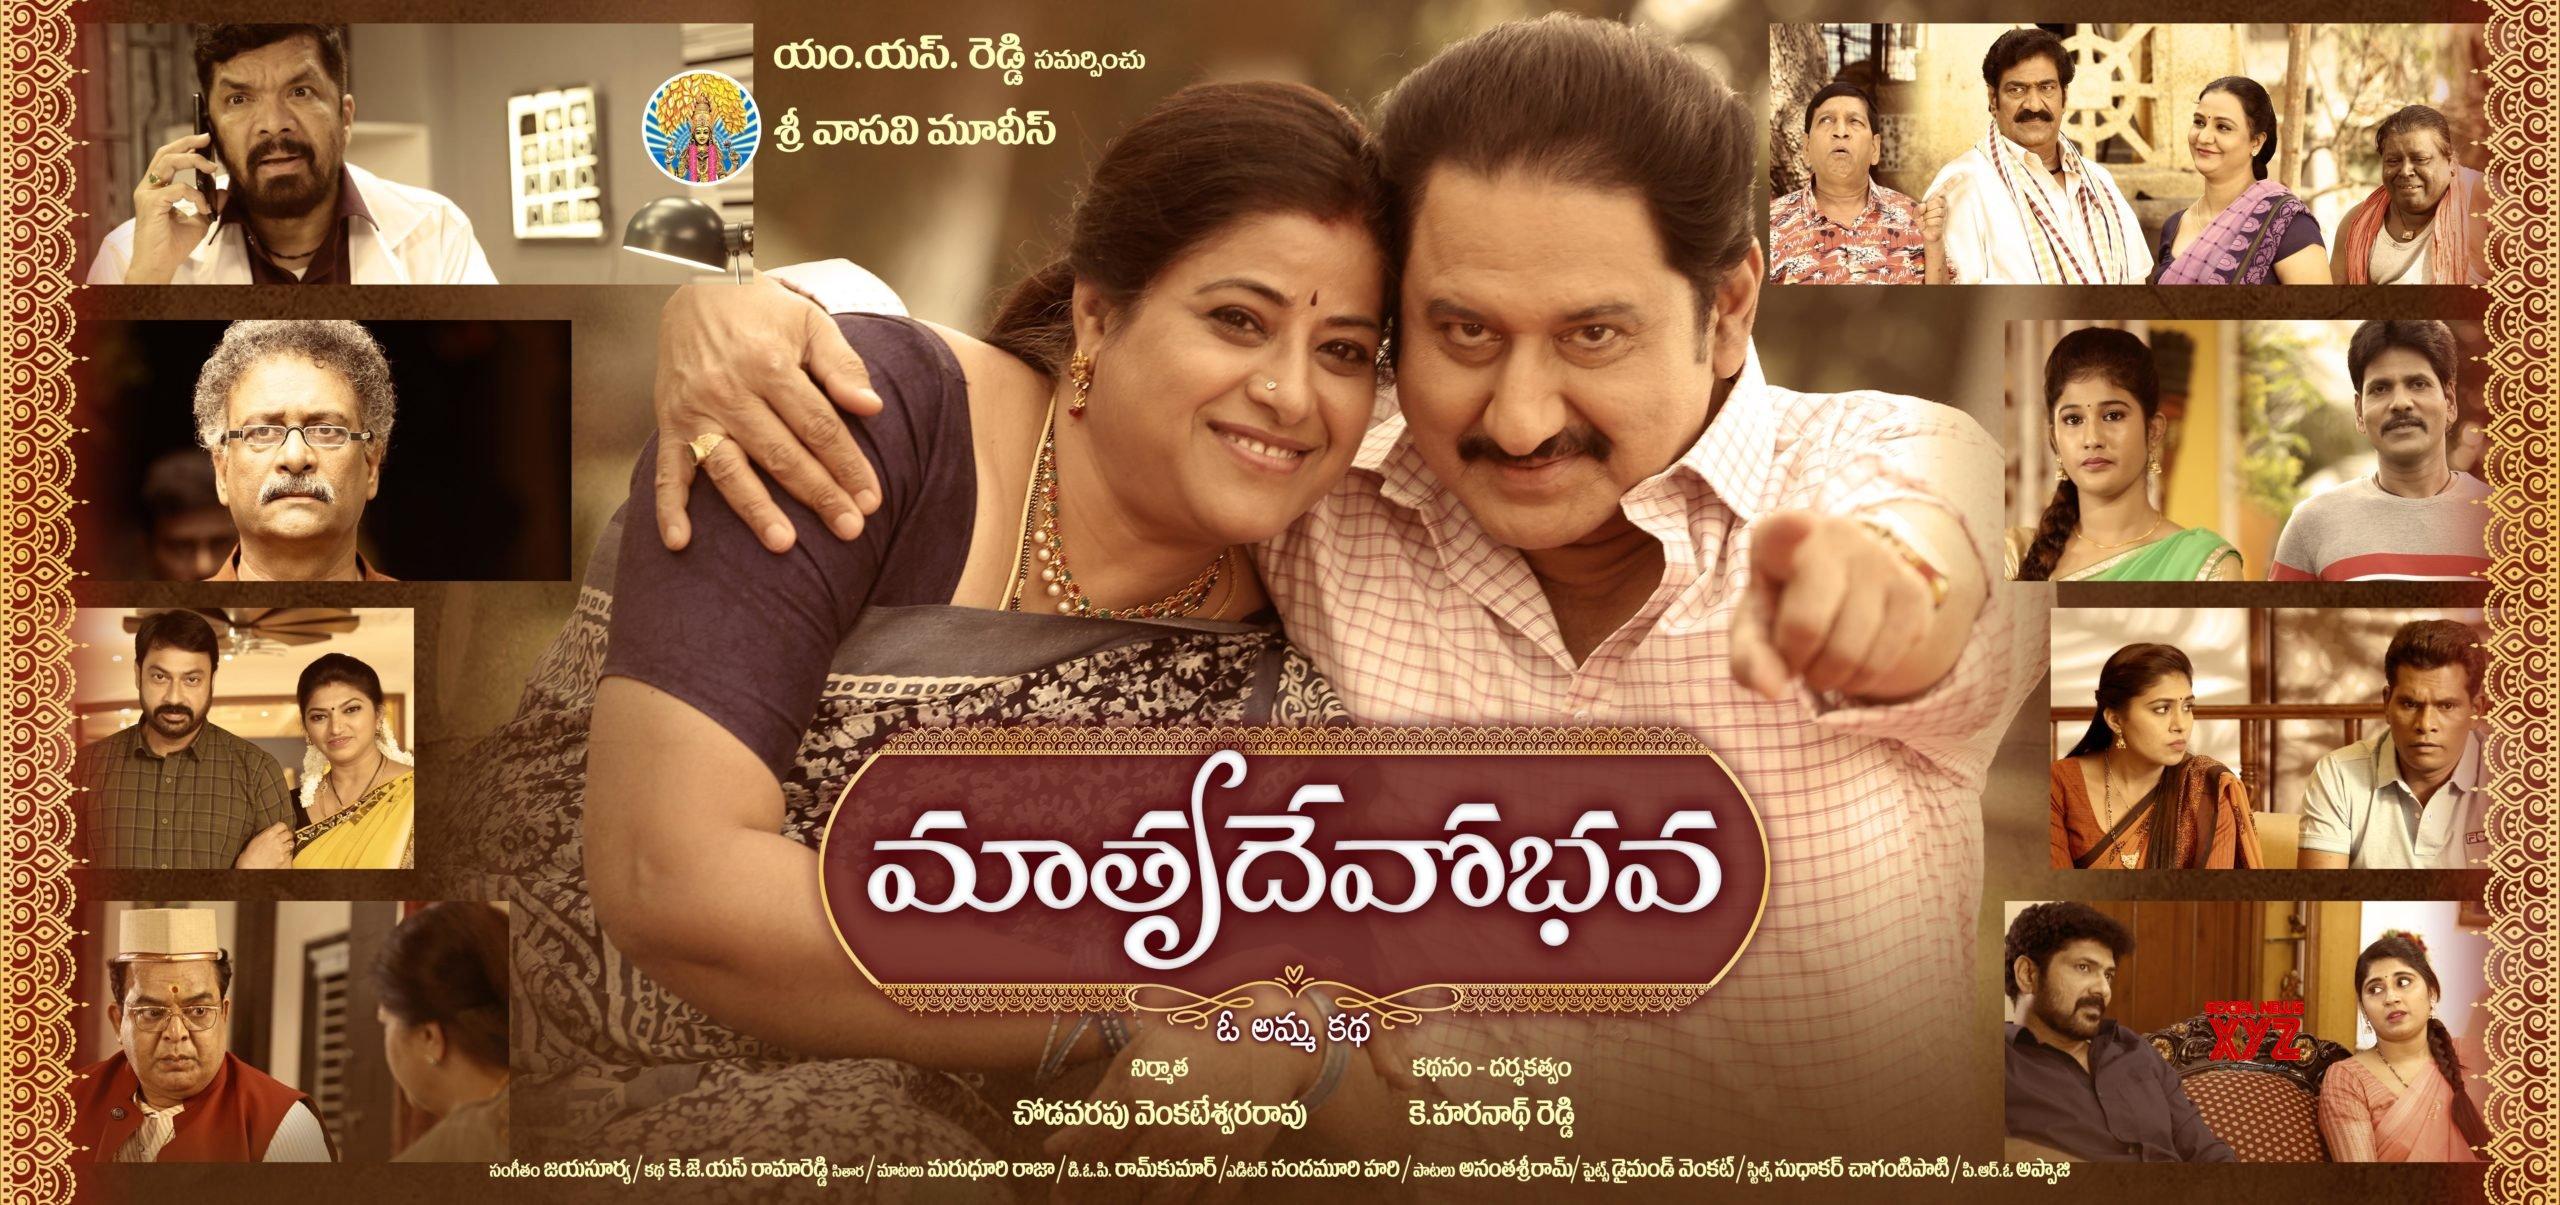 Mathrudevobhava Movie Stills And Posters